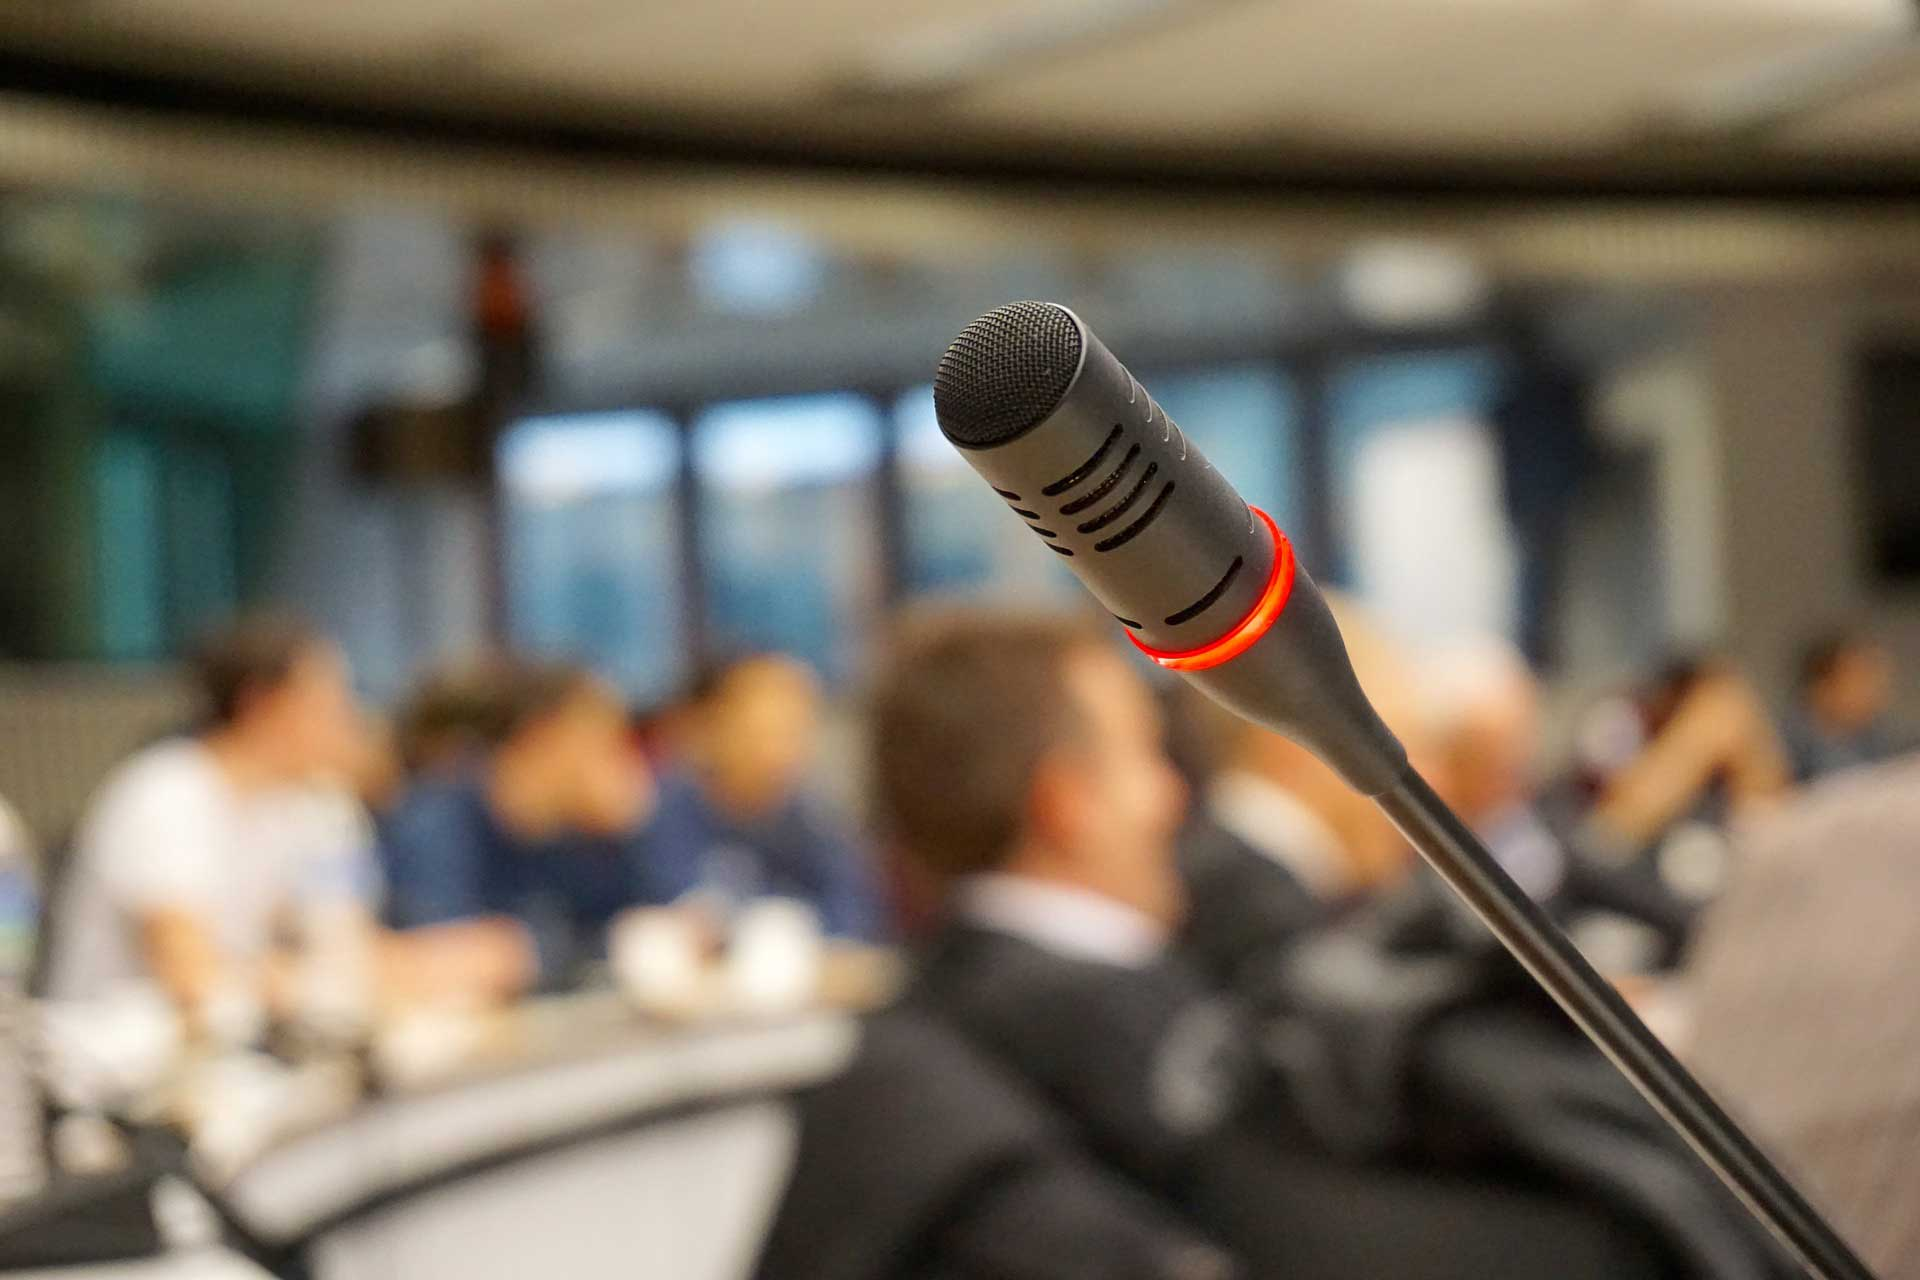 neverbalna komunikacija i javni govor